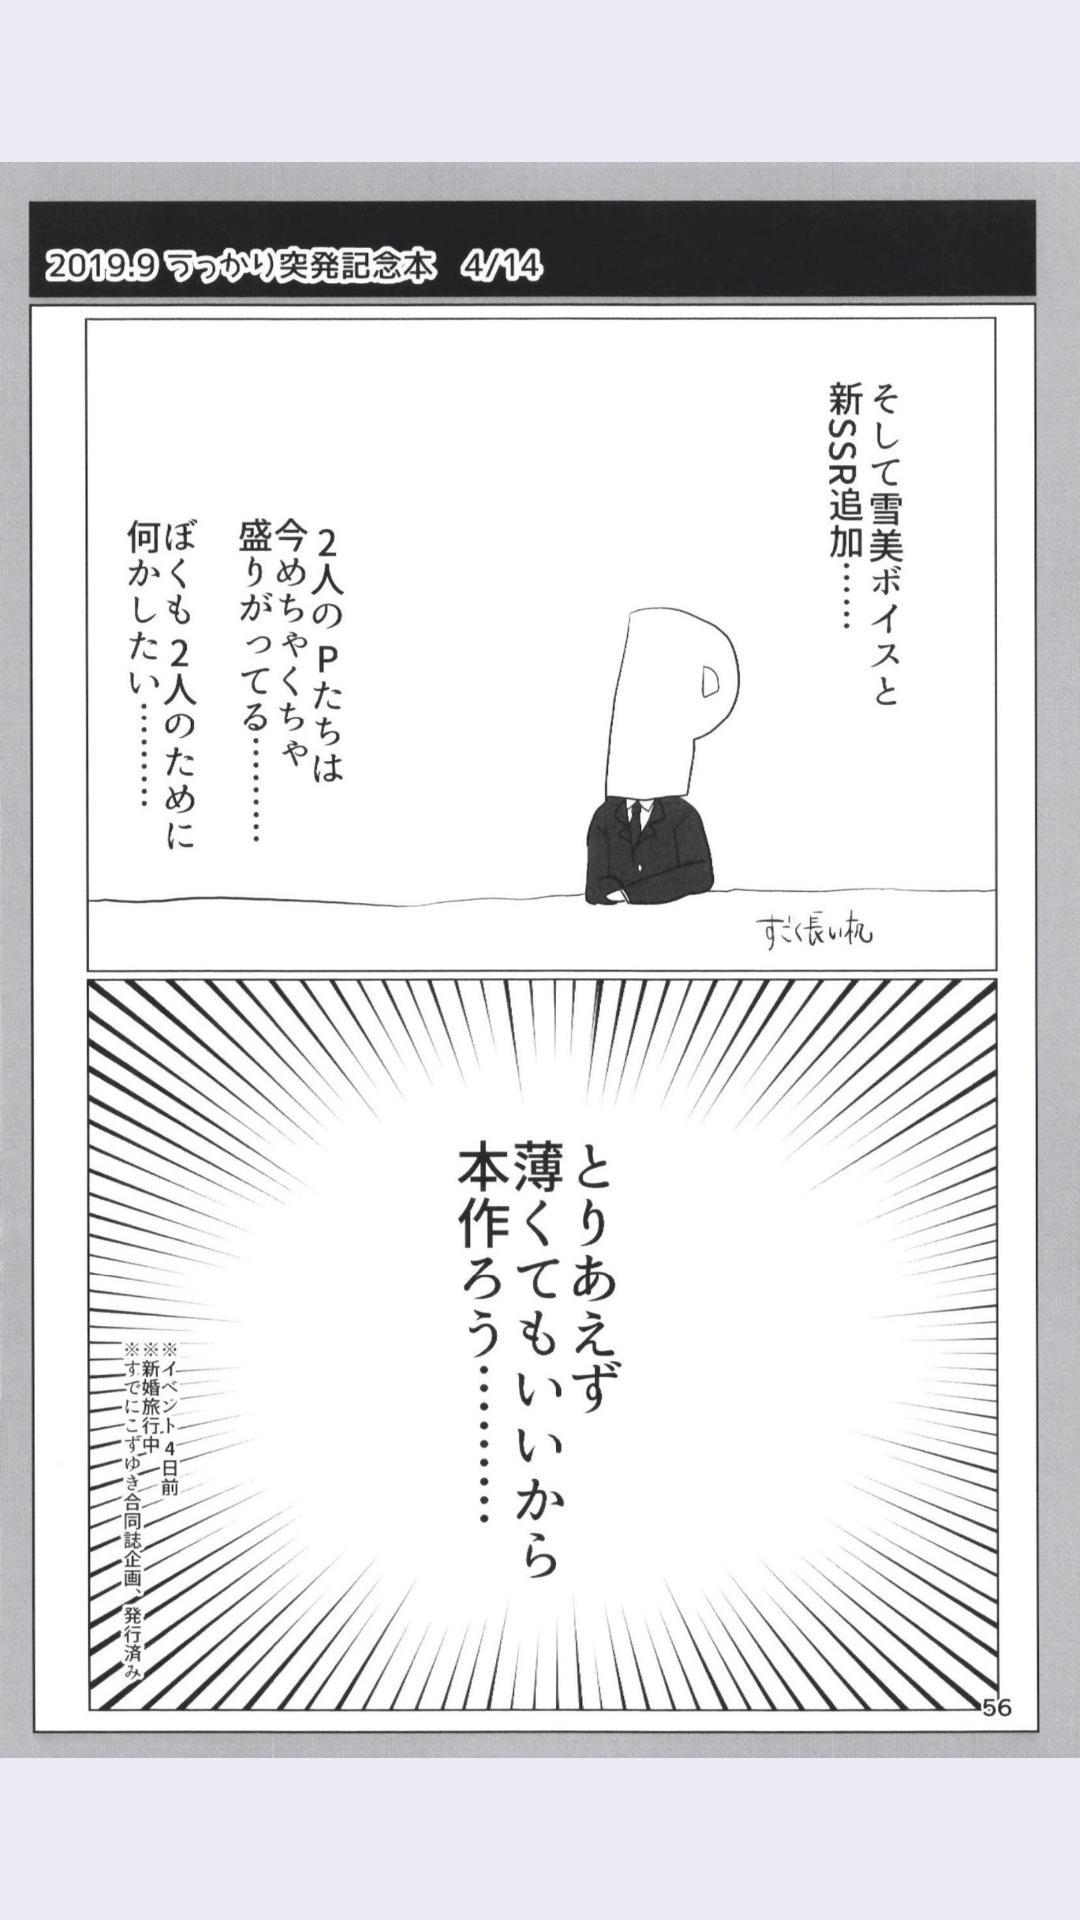 Dodotsukiya 2018-2019 Matome 55